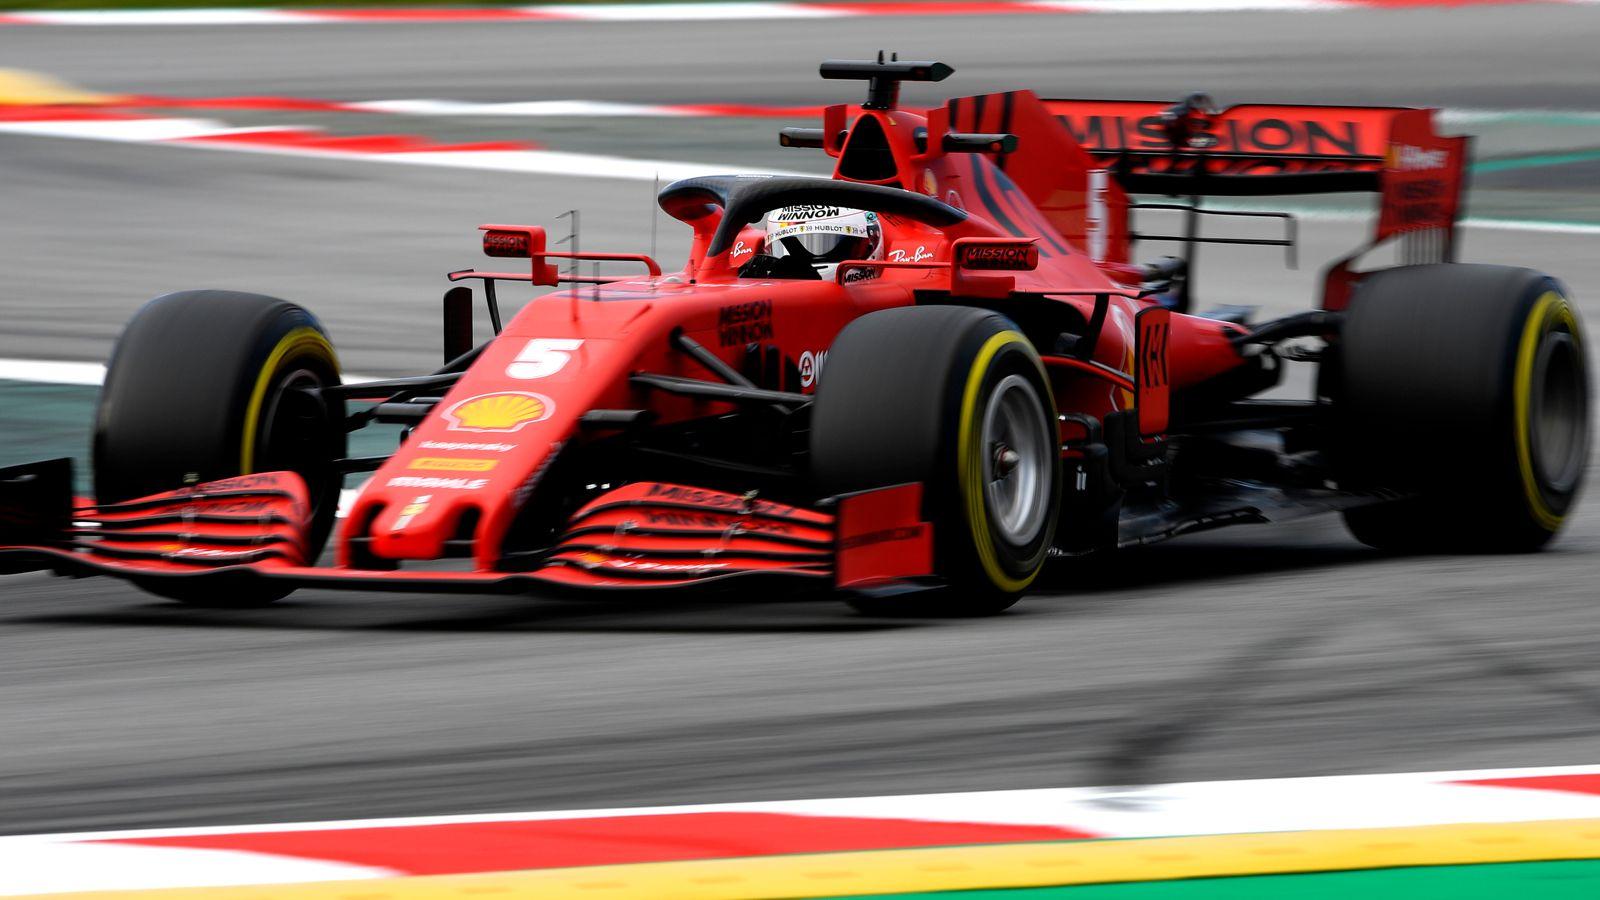 F1 Testing: Test Two Day Two AM: Sebastian Vettel, Ferrari show pace